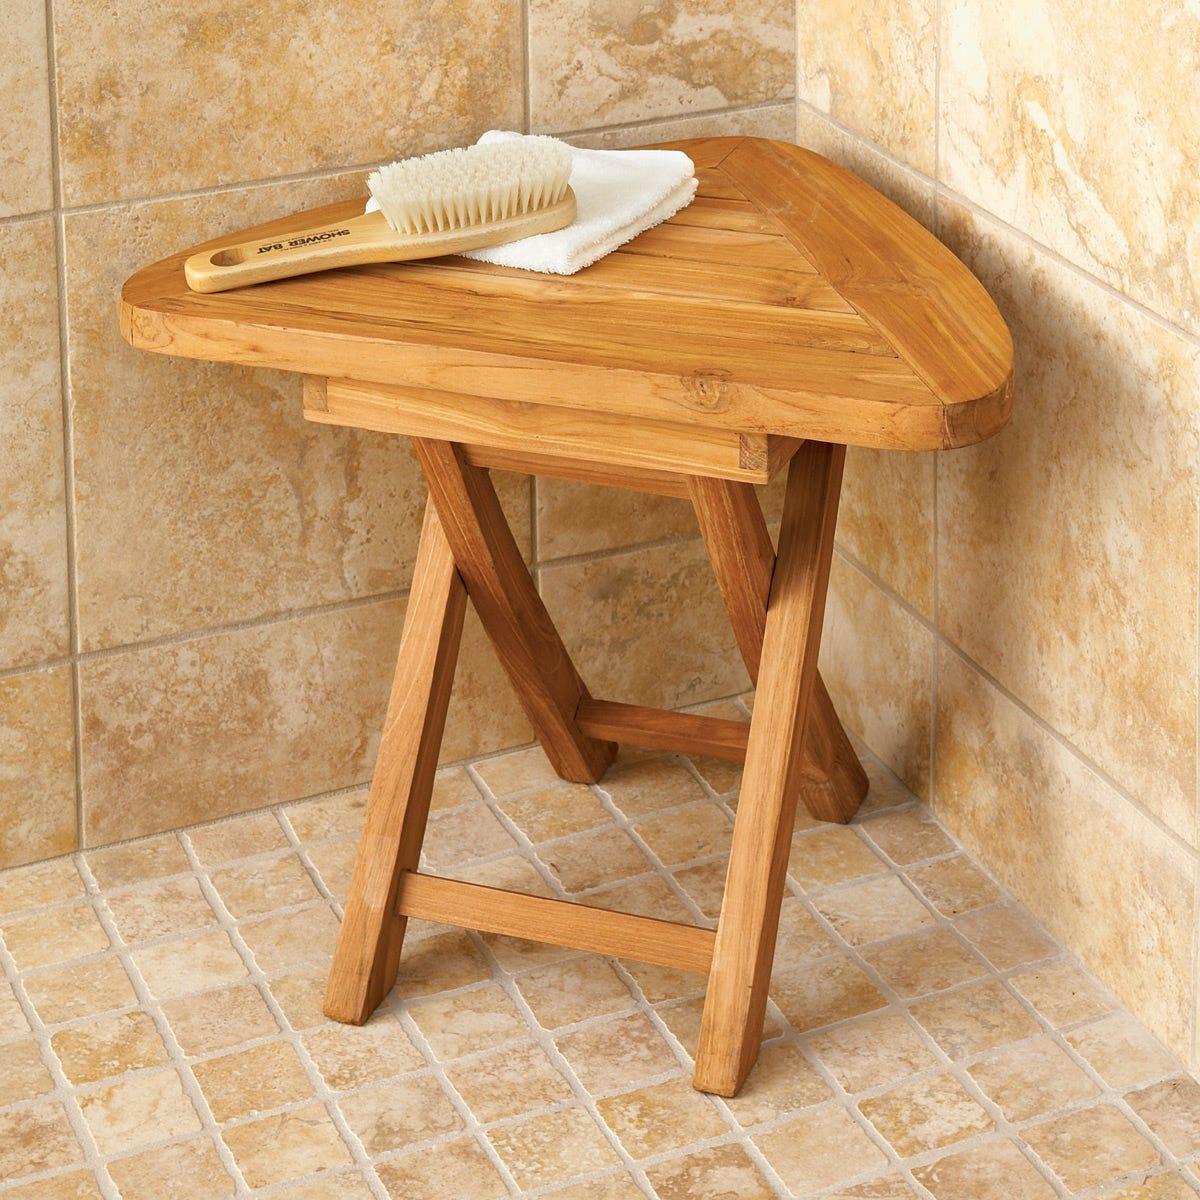 corner stools find cheap teak a regarding stool shower bathroom wood bench